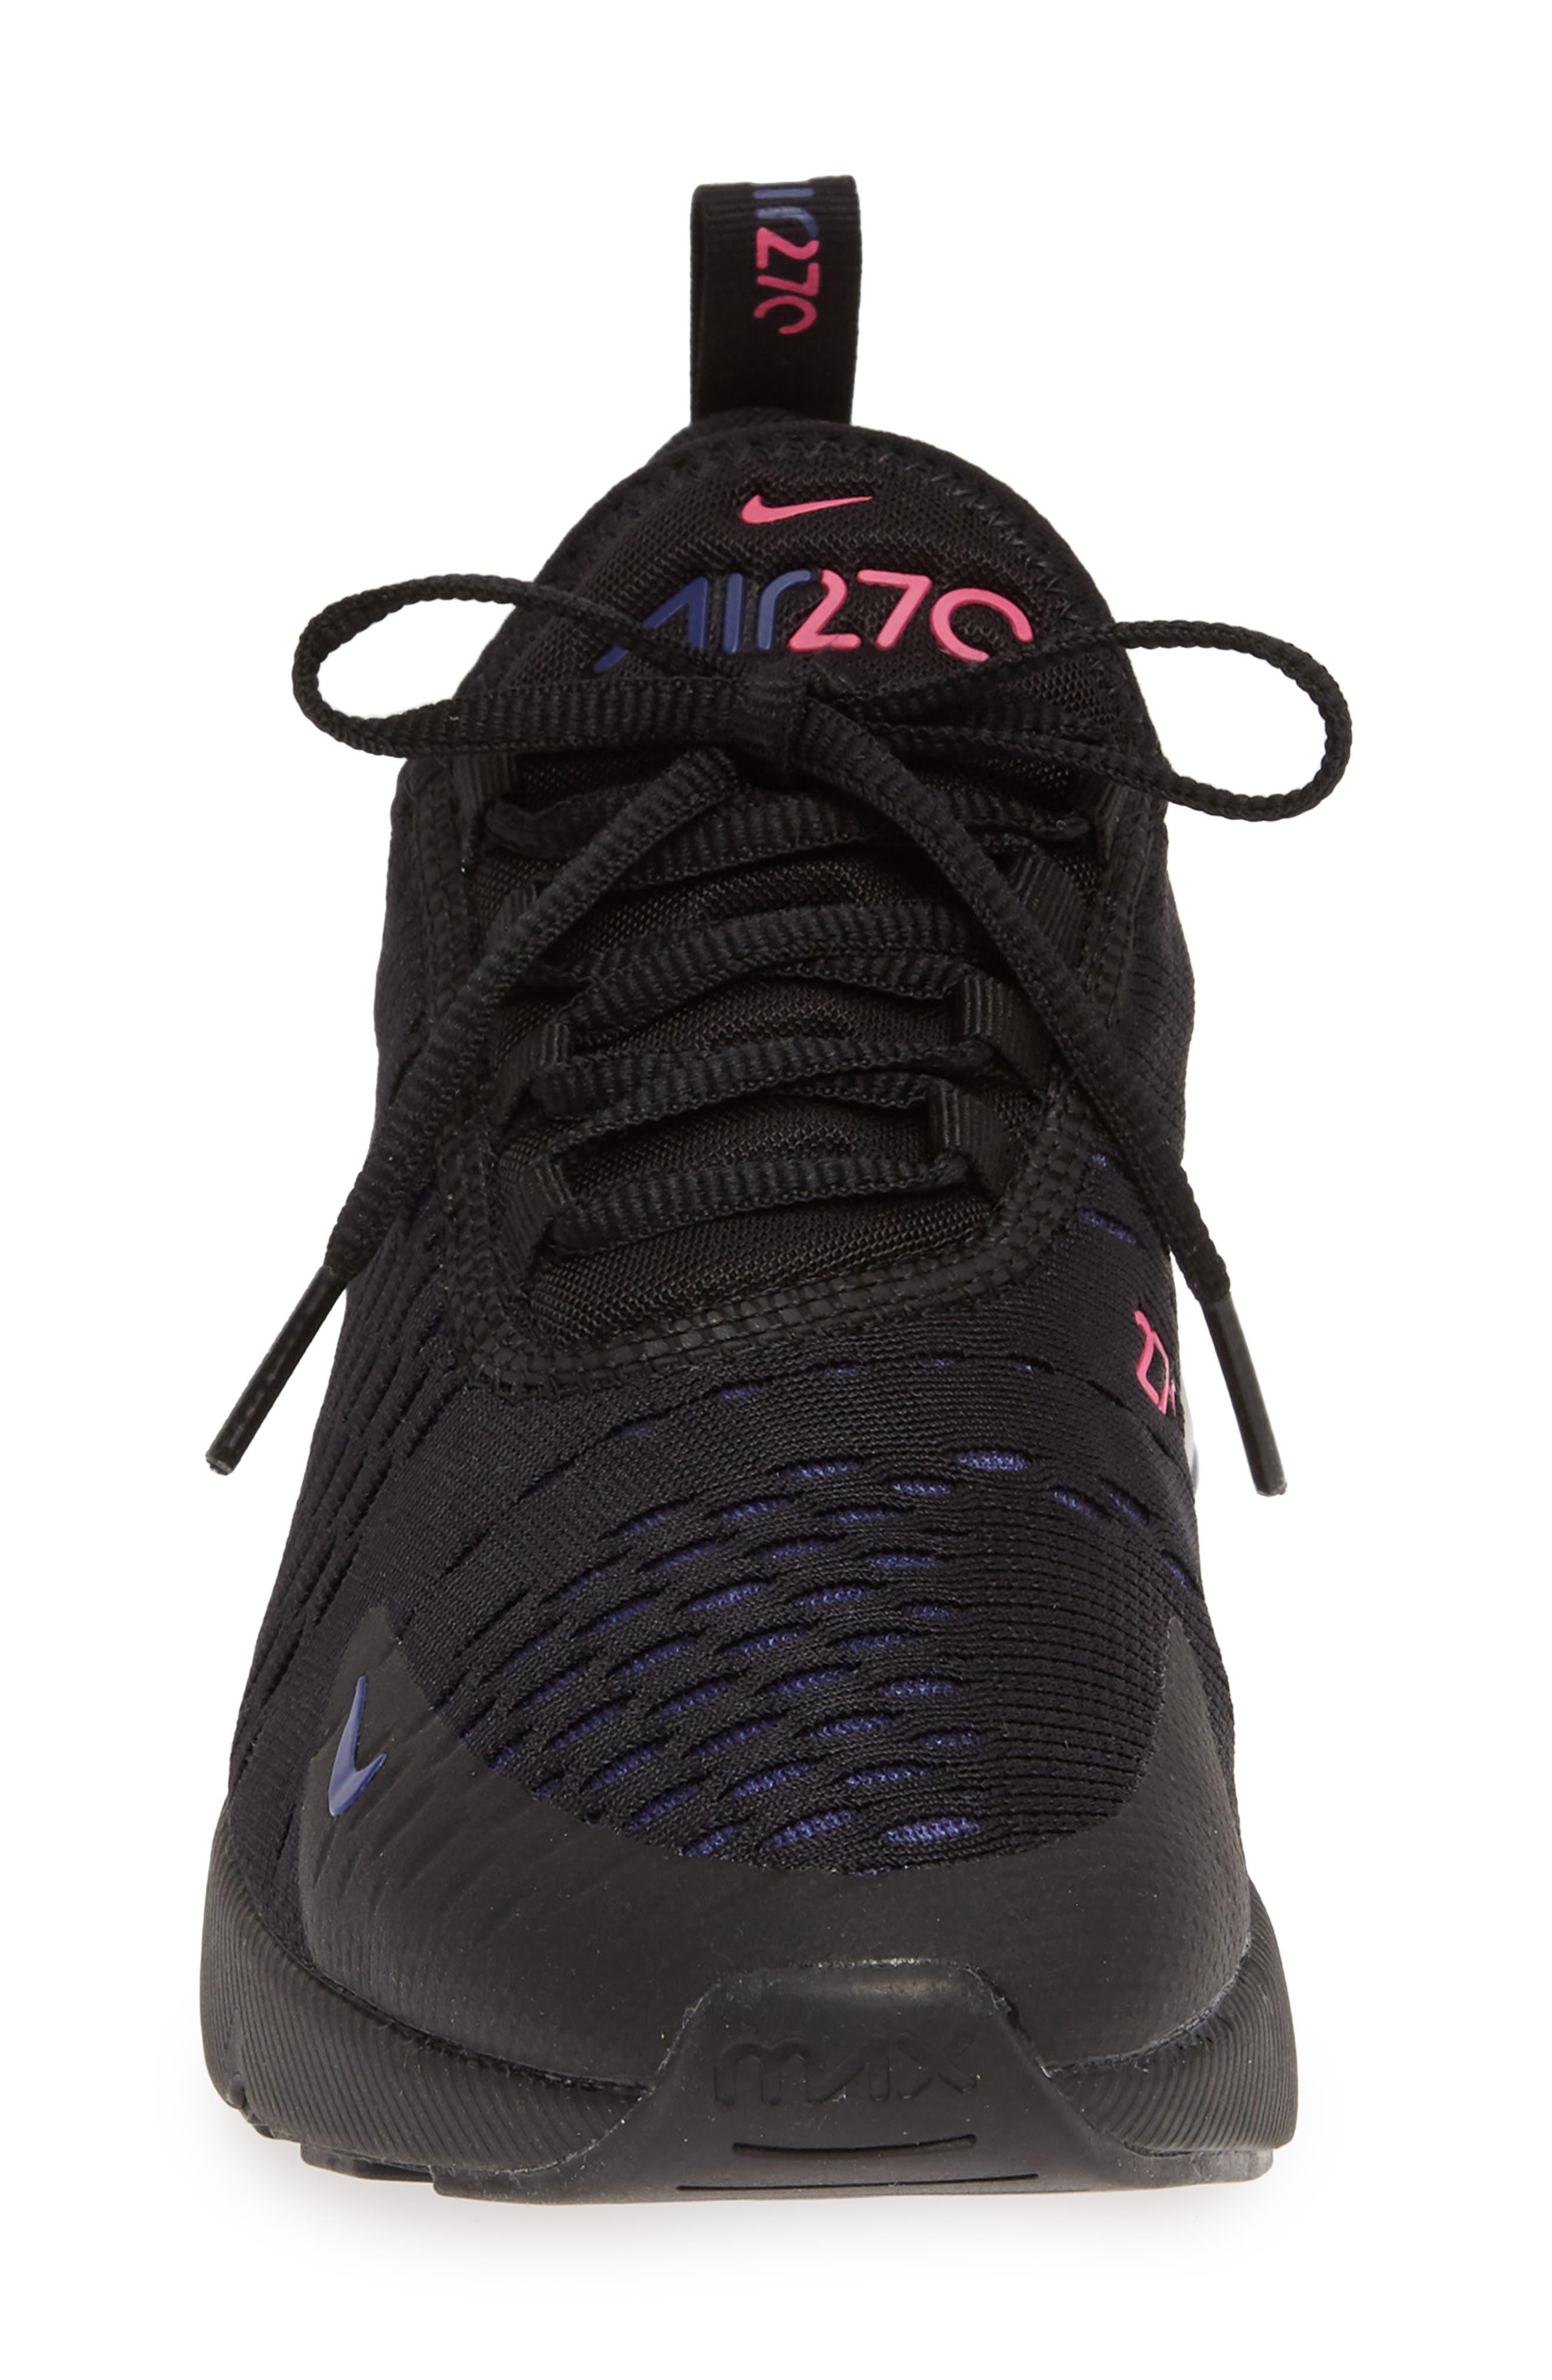 NIKE,                             Air Max 270 Premium Sneaker,                             Alternate thumbnail 4, color,                             BLACK/ FUCHSIA/ PURPLE